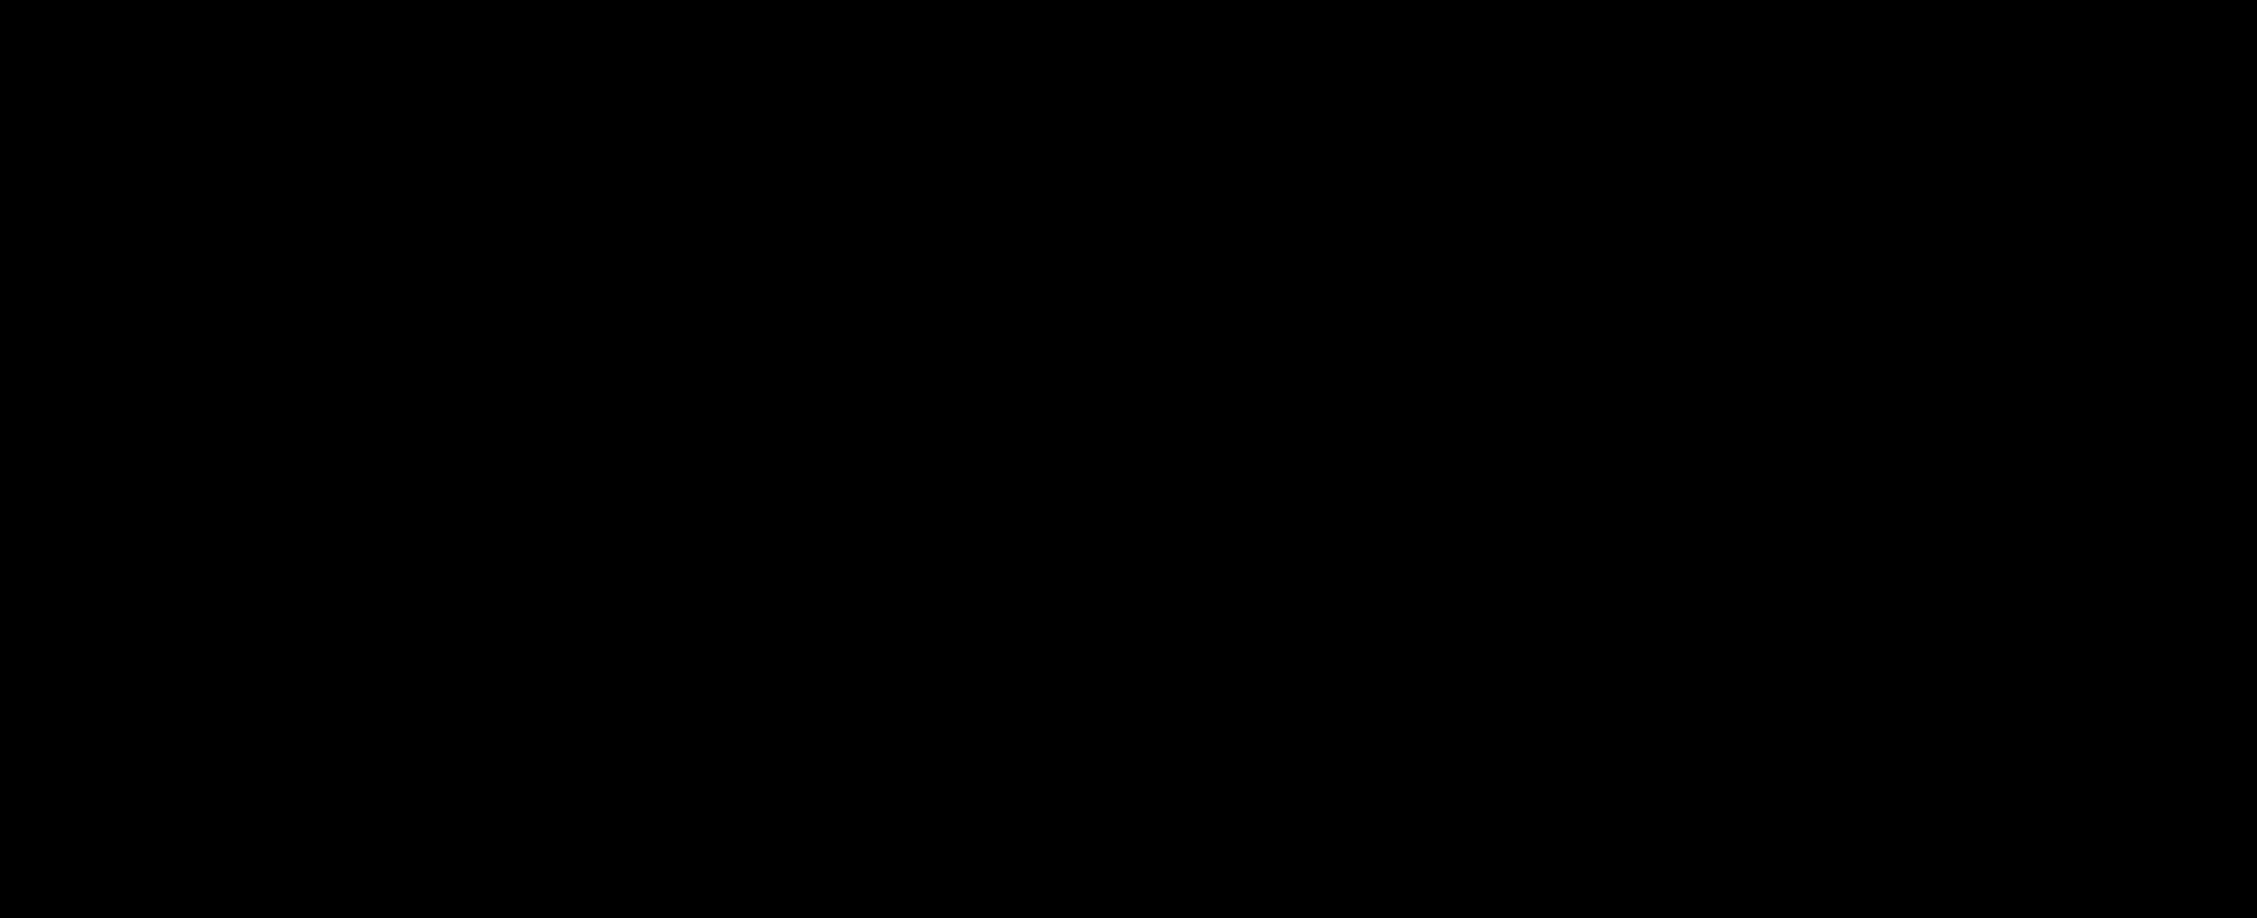 4-(4-Hydroxy-3-methoxy-d<sub>3</sub>-benzylidene)curcumin